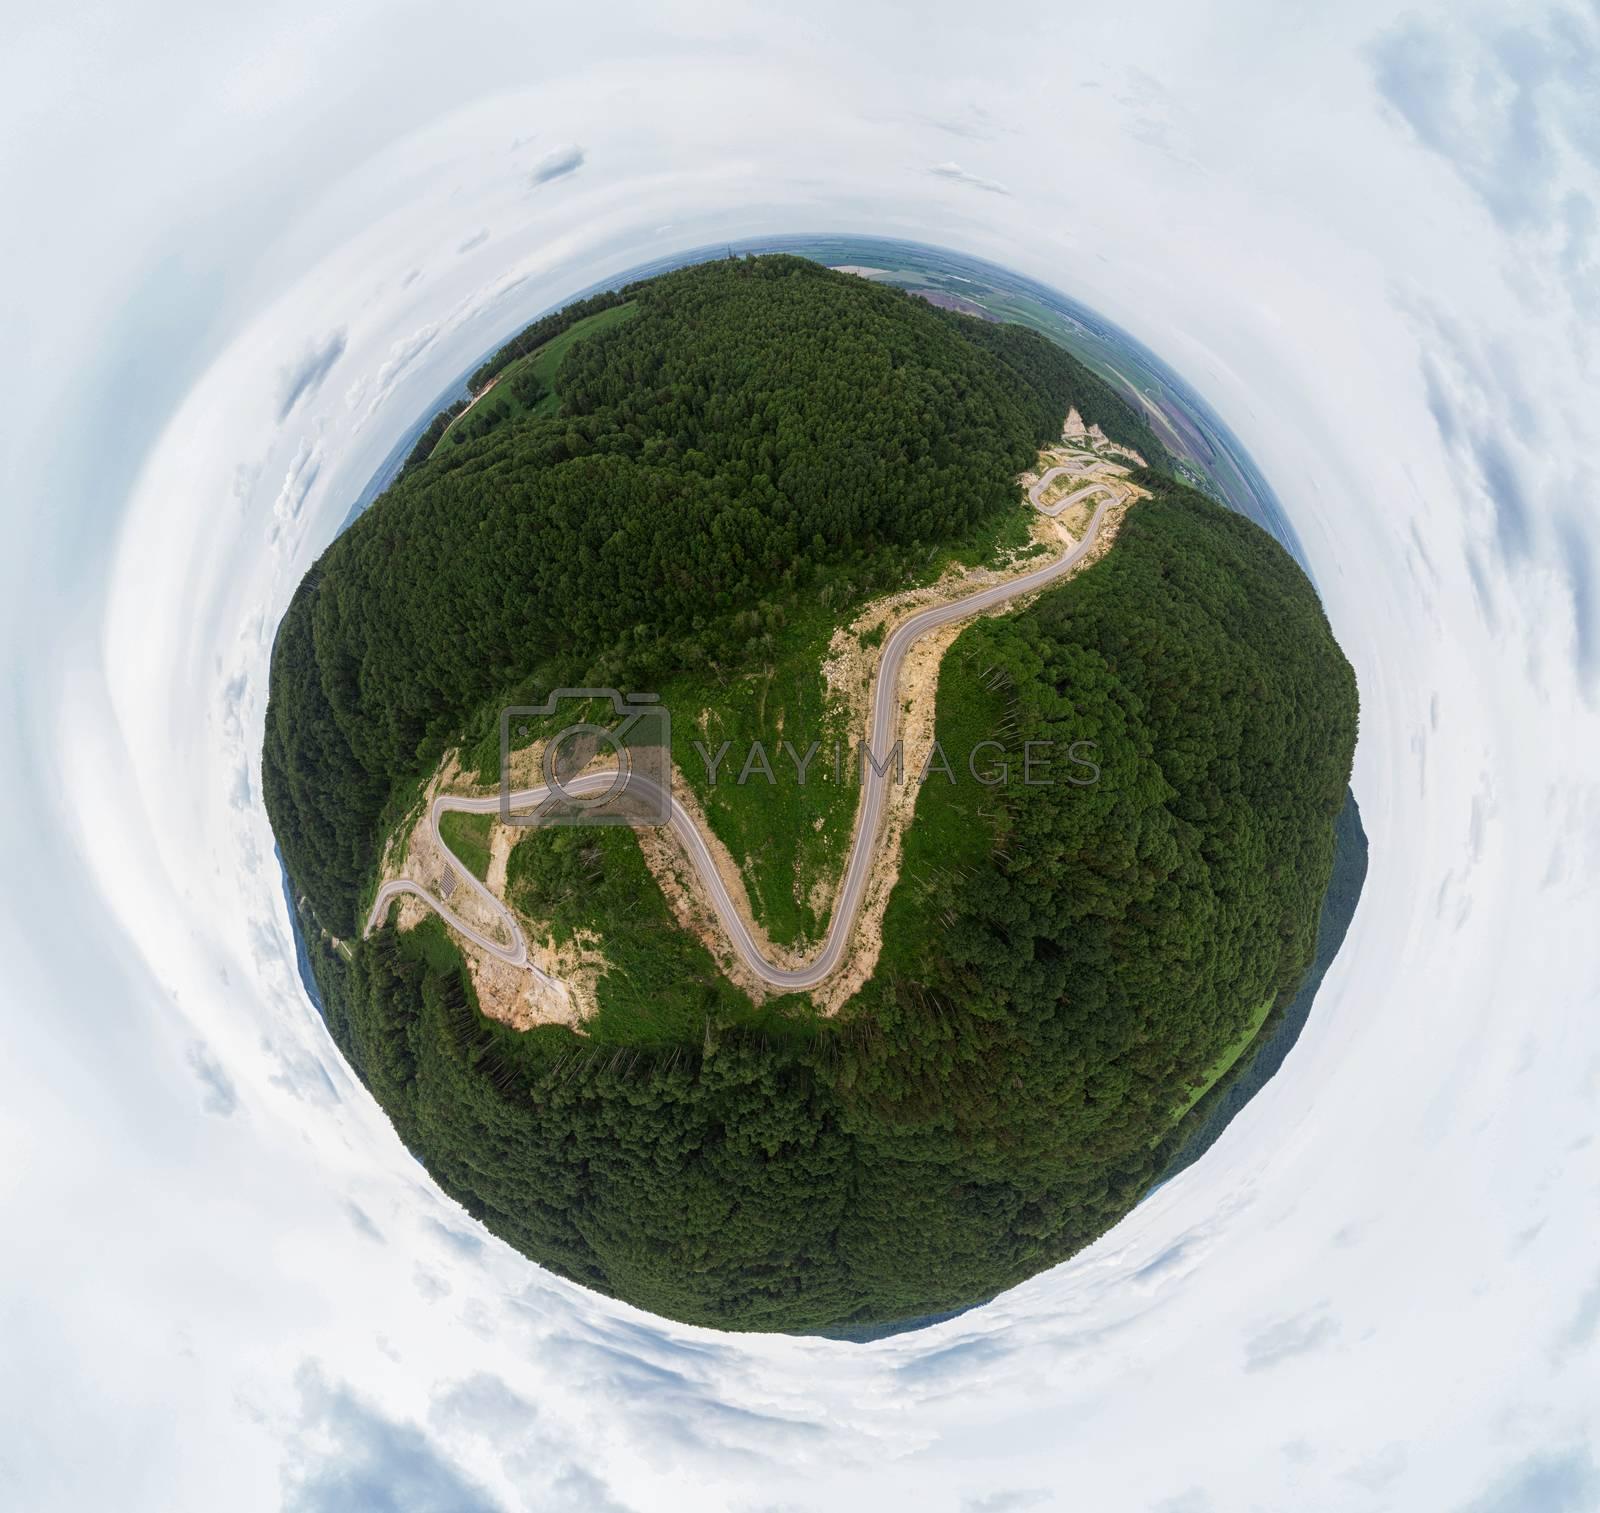 360 spherical panorama of aerial top vew of winding road in the mountains, Altai Krai, Western Siberia, Russia. Road to Resort town Belokurikha 2. Virtual reality content